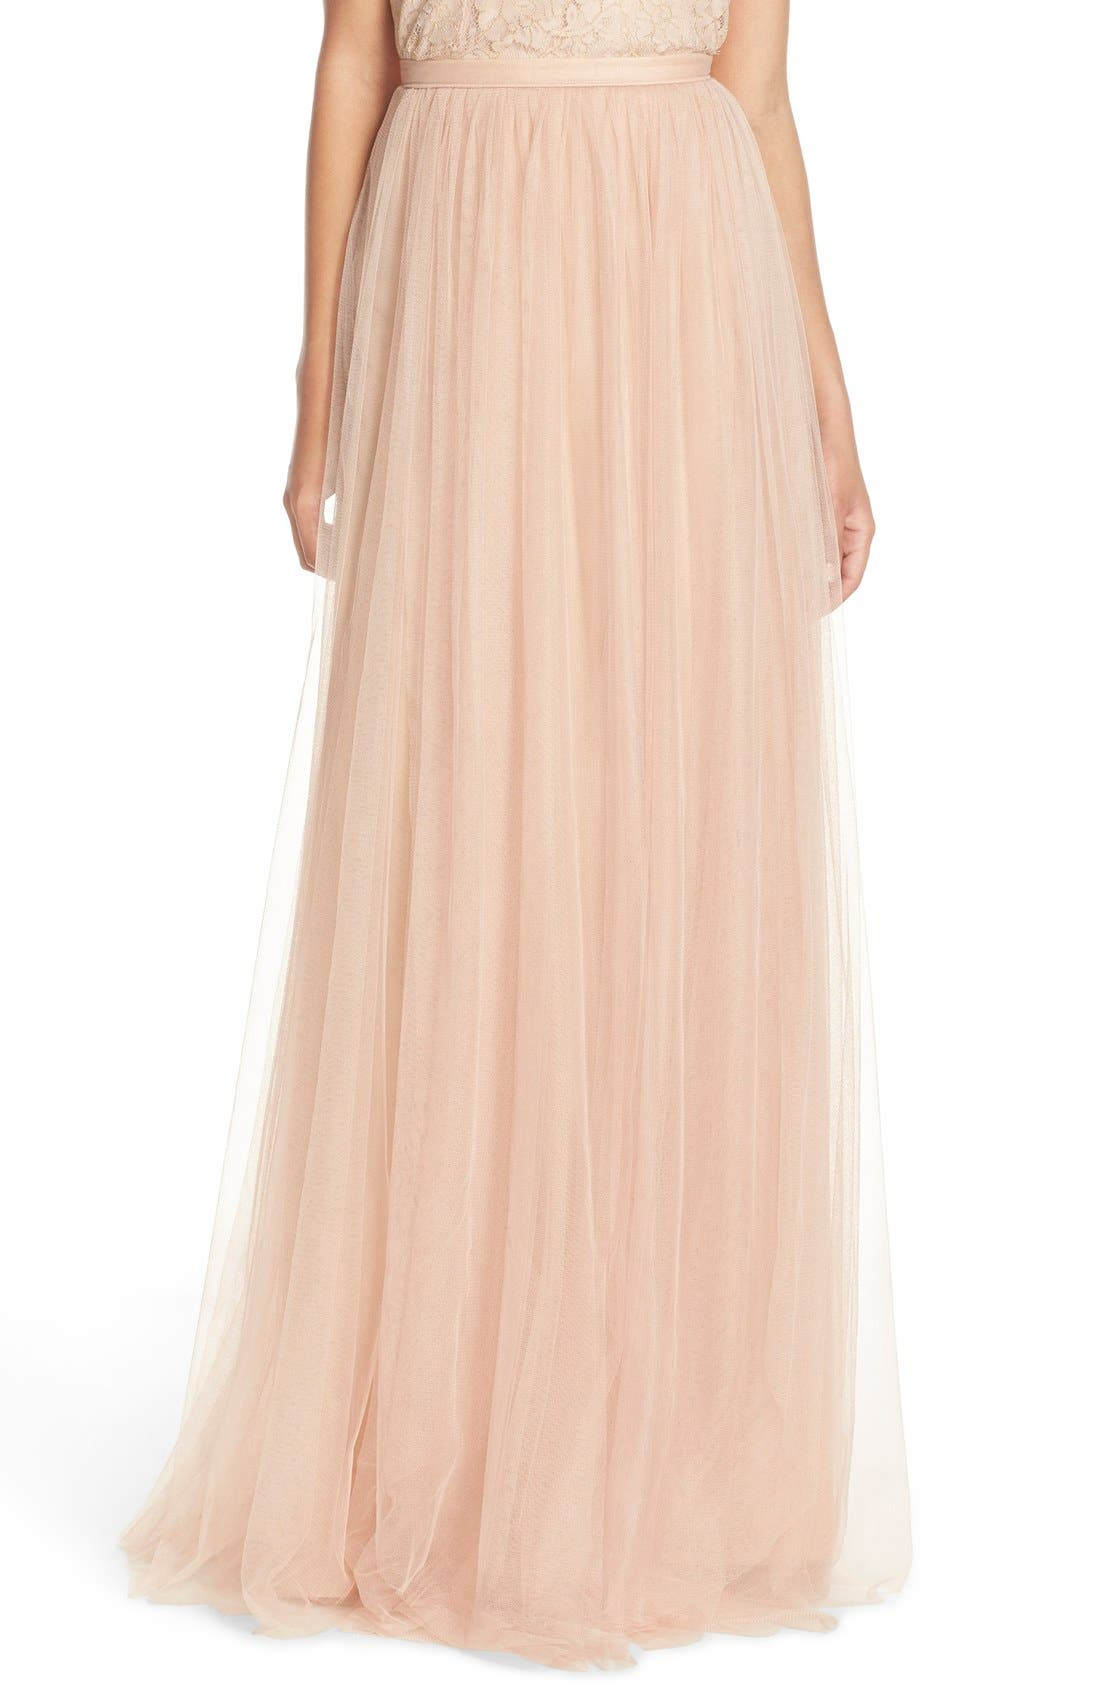 Arabella Tulle Ballgown Skirt,                             Main thumbnail 1, color,                             685